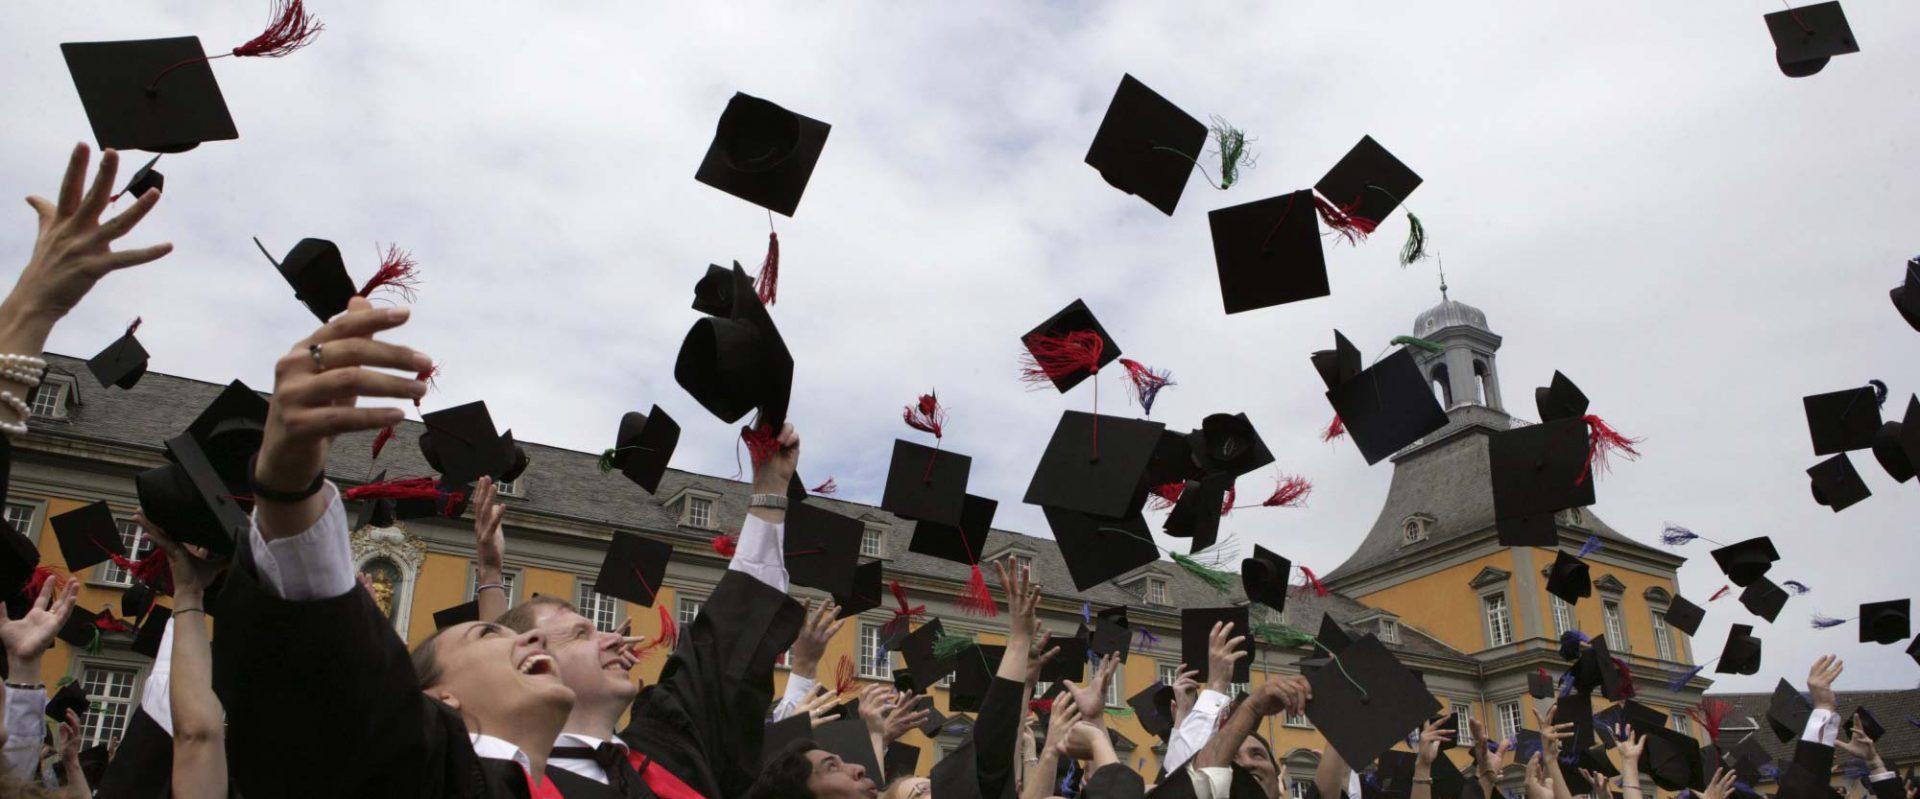 Tuition Free Illinois